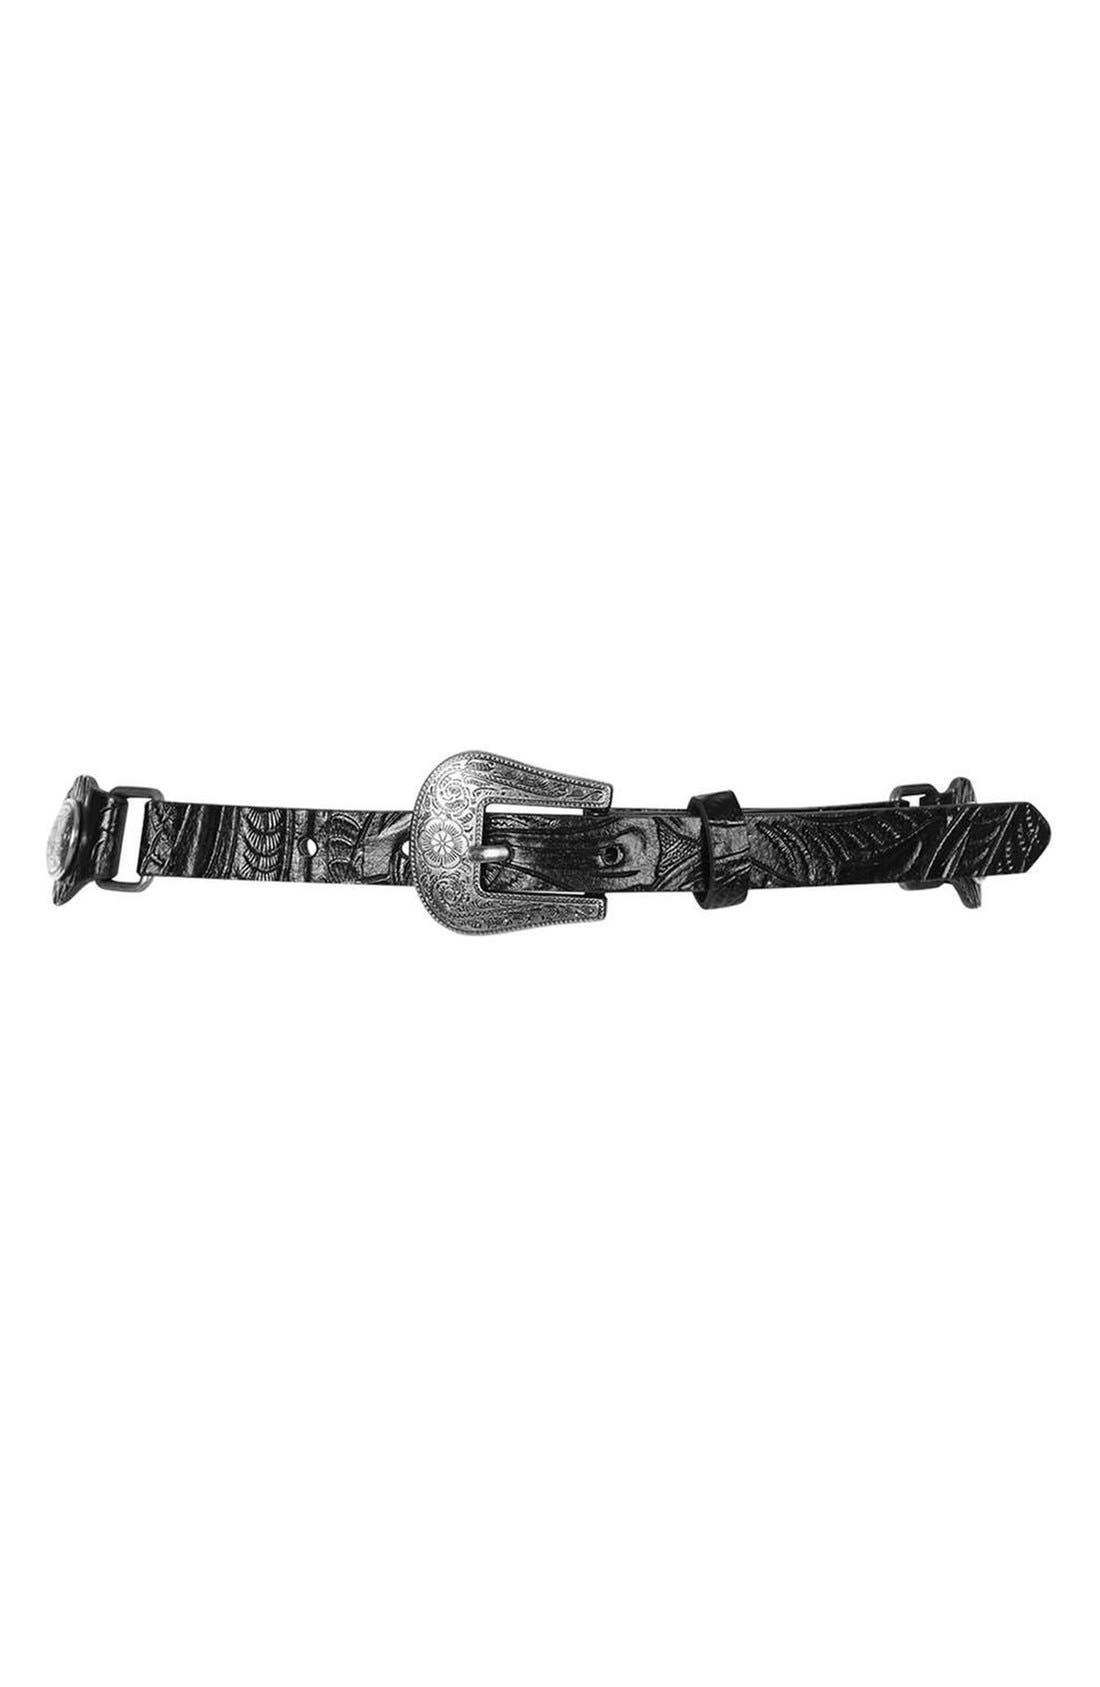 Alternate Image 1 Selected - Topshop Embossed Faux Leather Western Belt